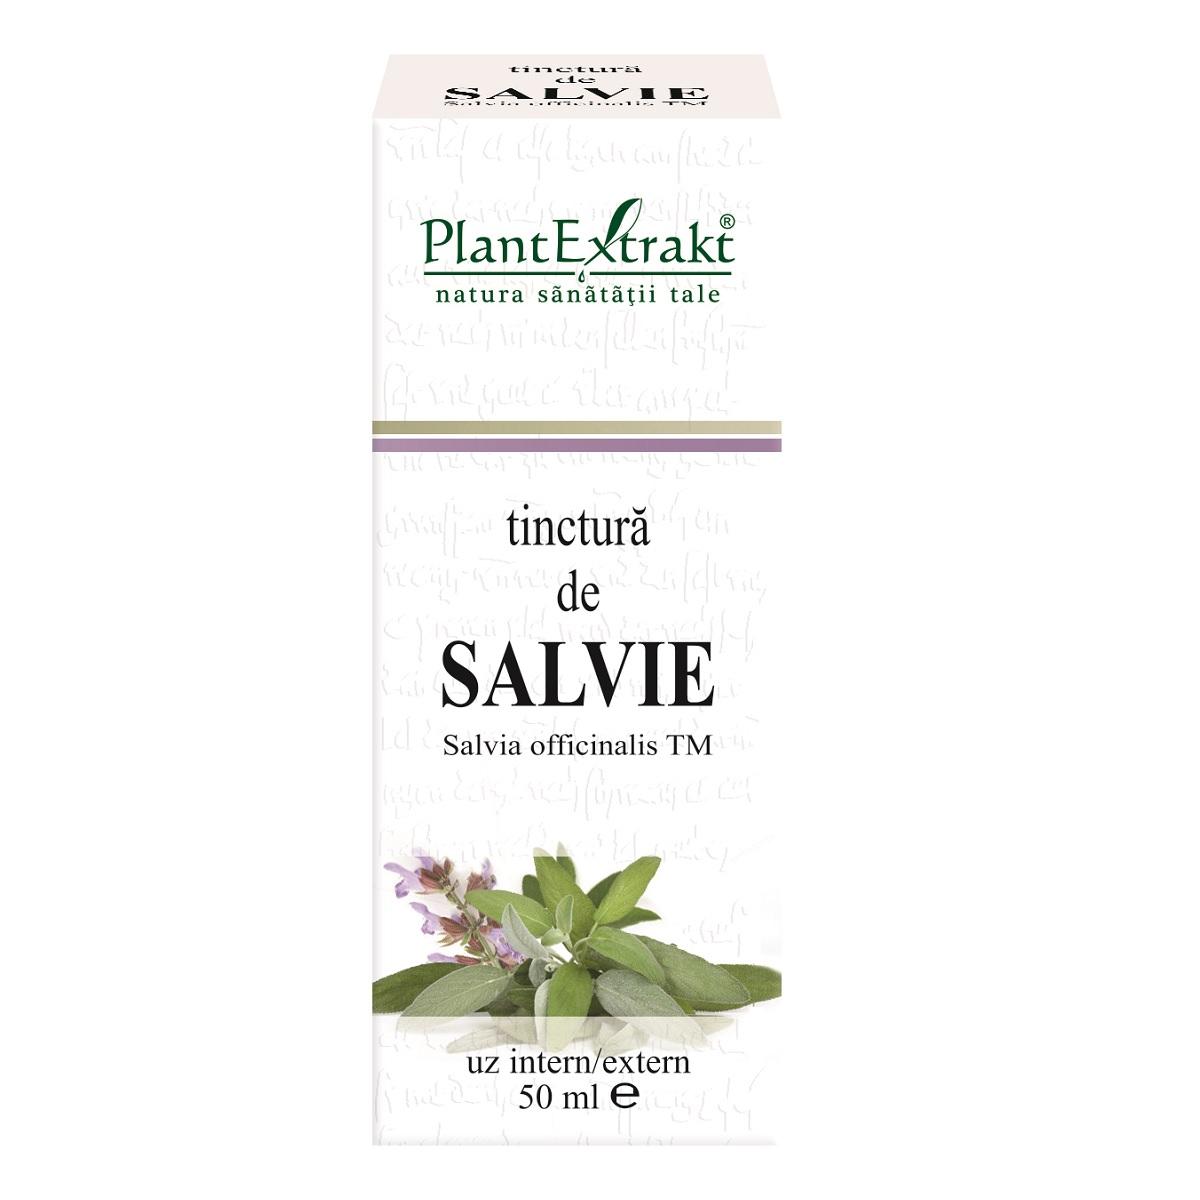 Tinctură de Salvie, 50 ml, Plant Extrakt